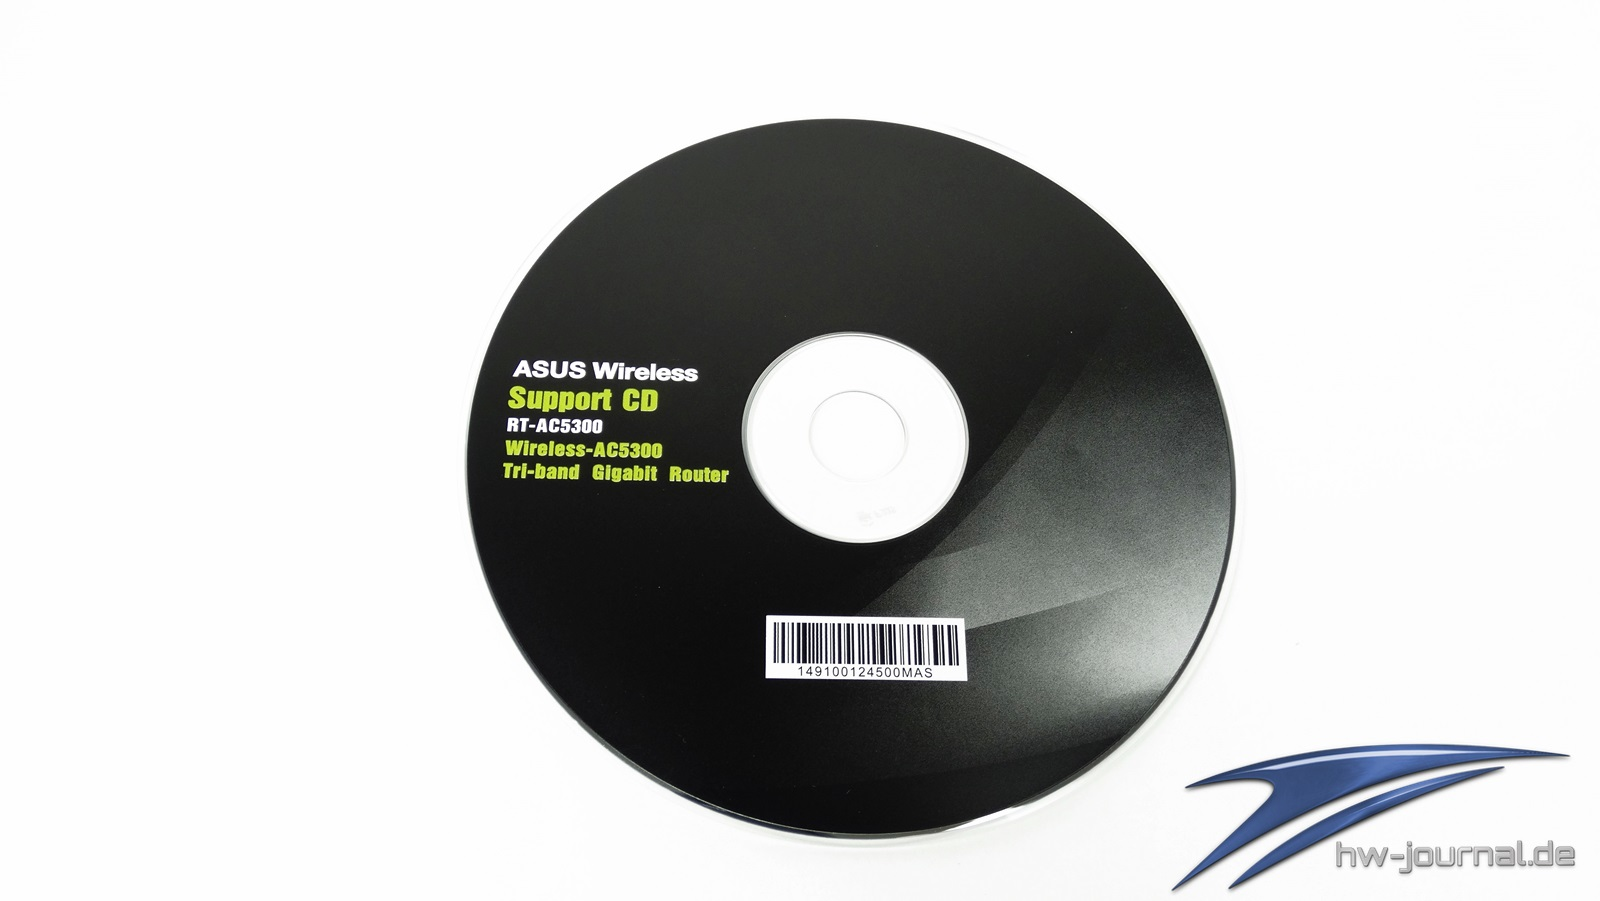 Test Asus Rt Ac5300 Hardware Journal Tri Band Gigabit Router Wireless Ac 5300 Mbps Im Berblick